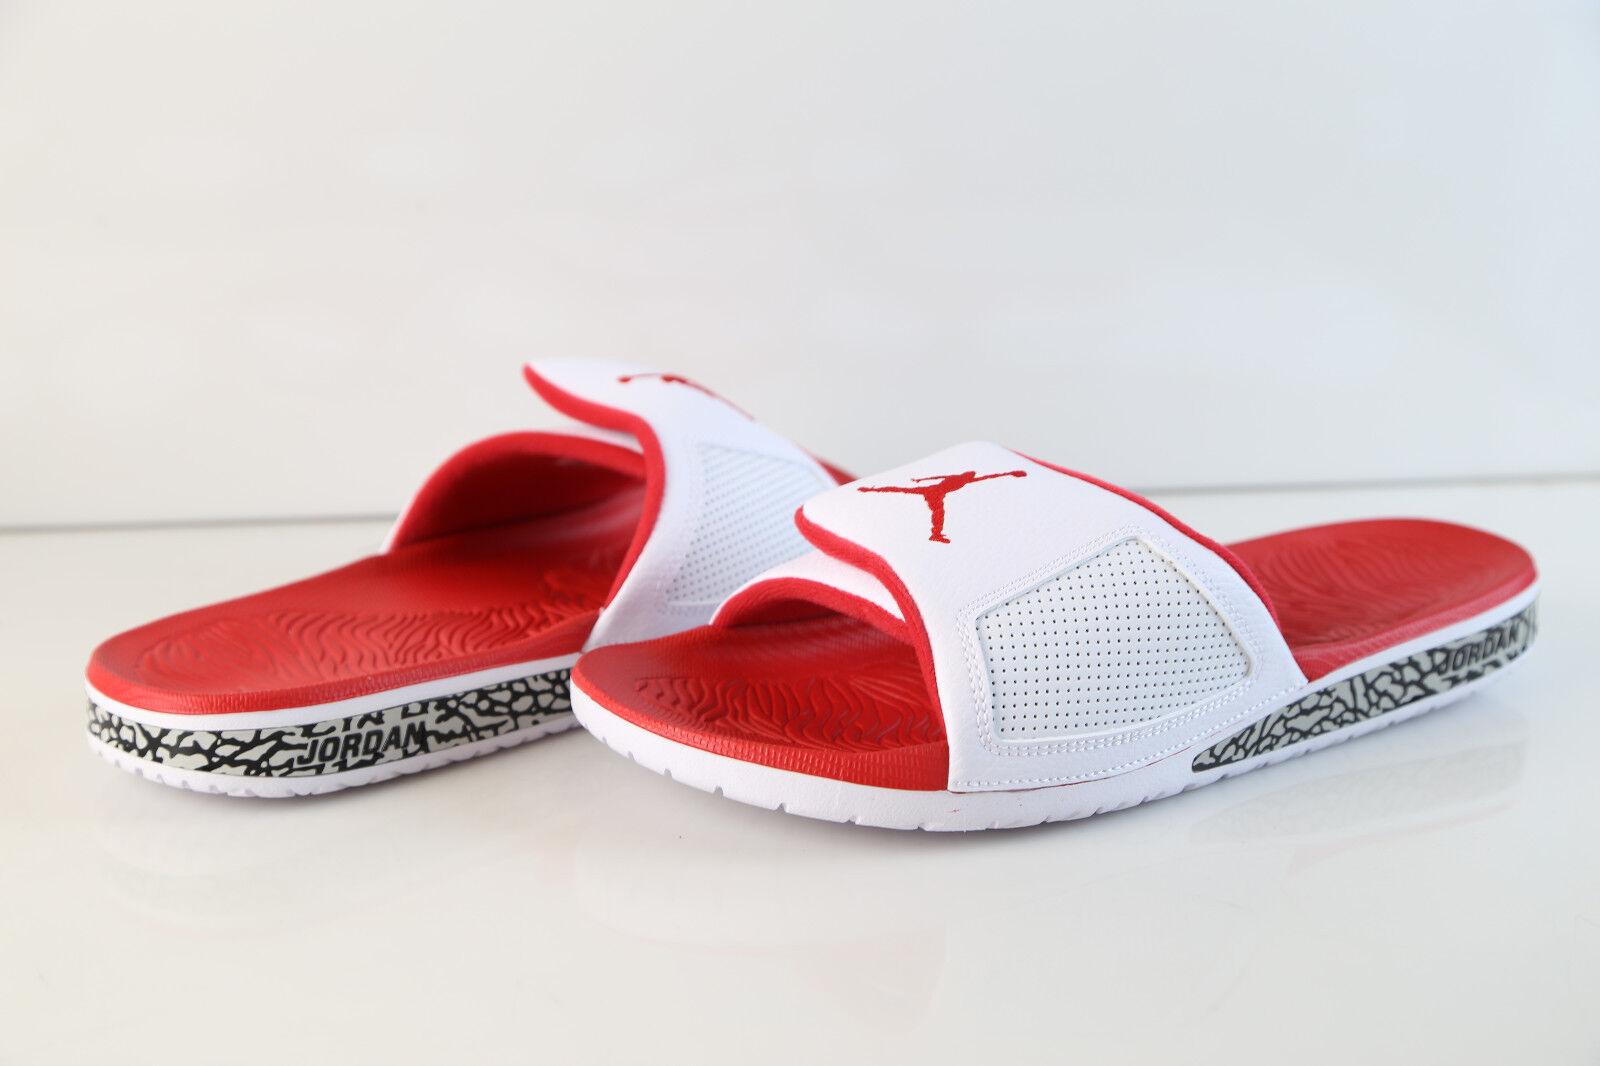 Air Jordan Hydro III Retro Slide White Fire Red 854556-116 7-14 sandal 3